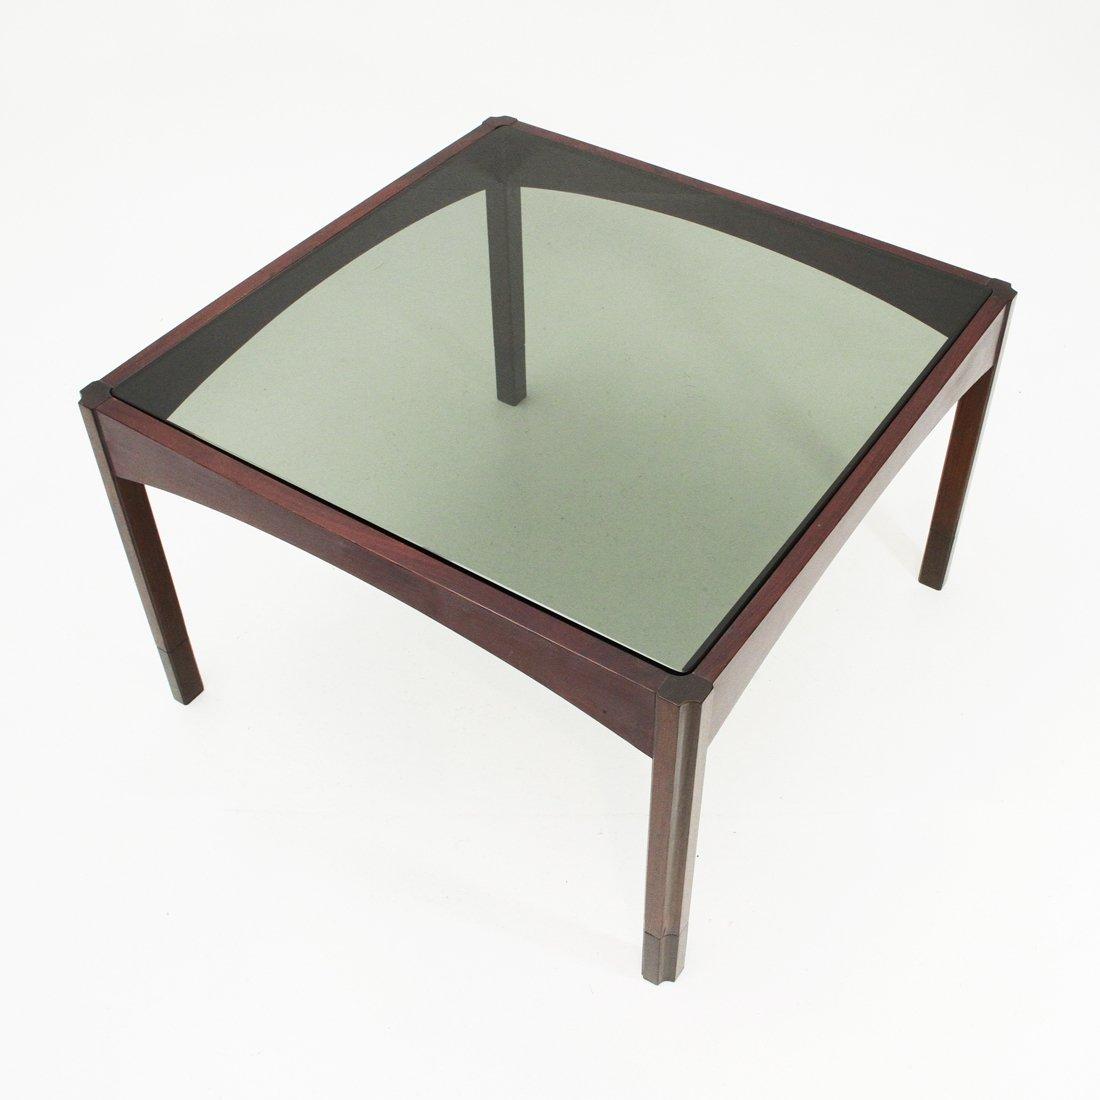 italian mid century square coffee table 1960s